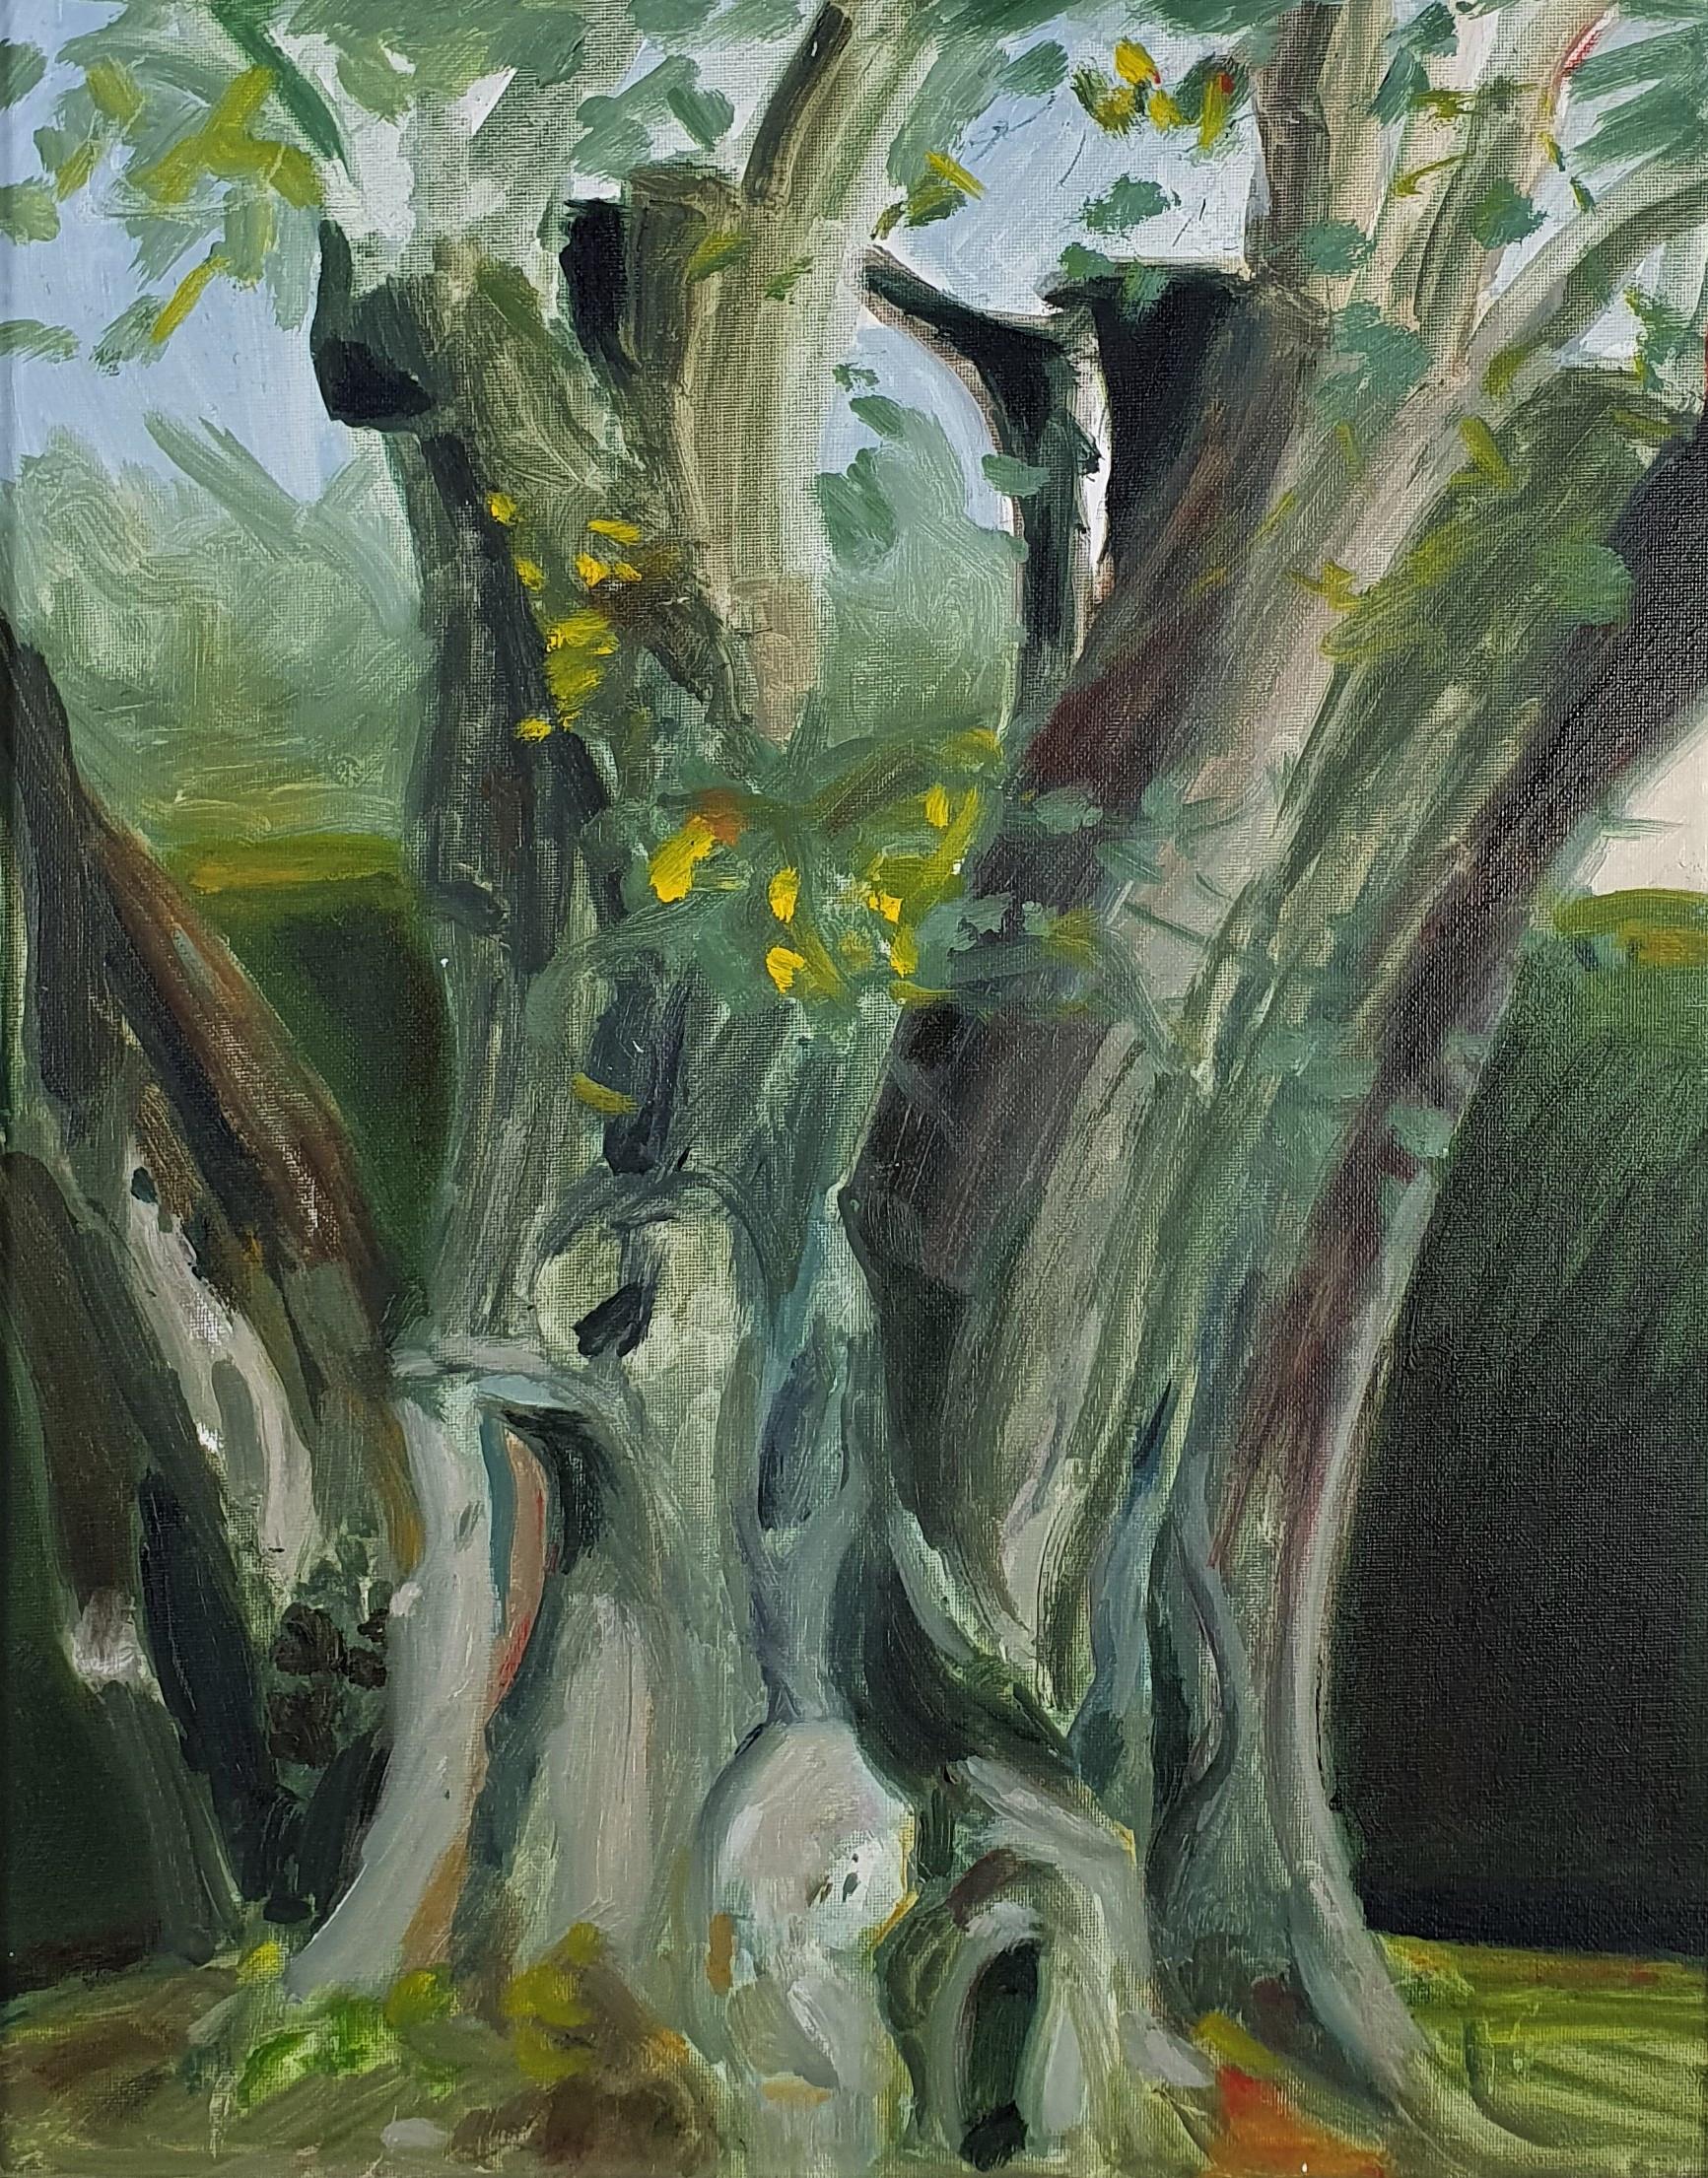 37. Tree of Life